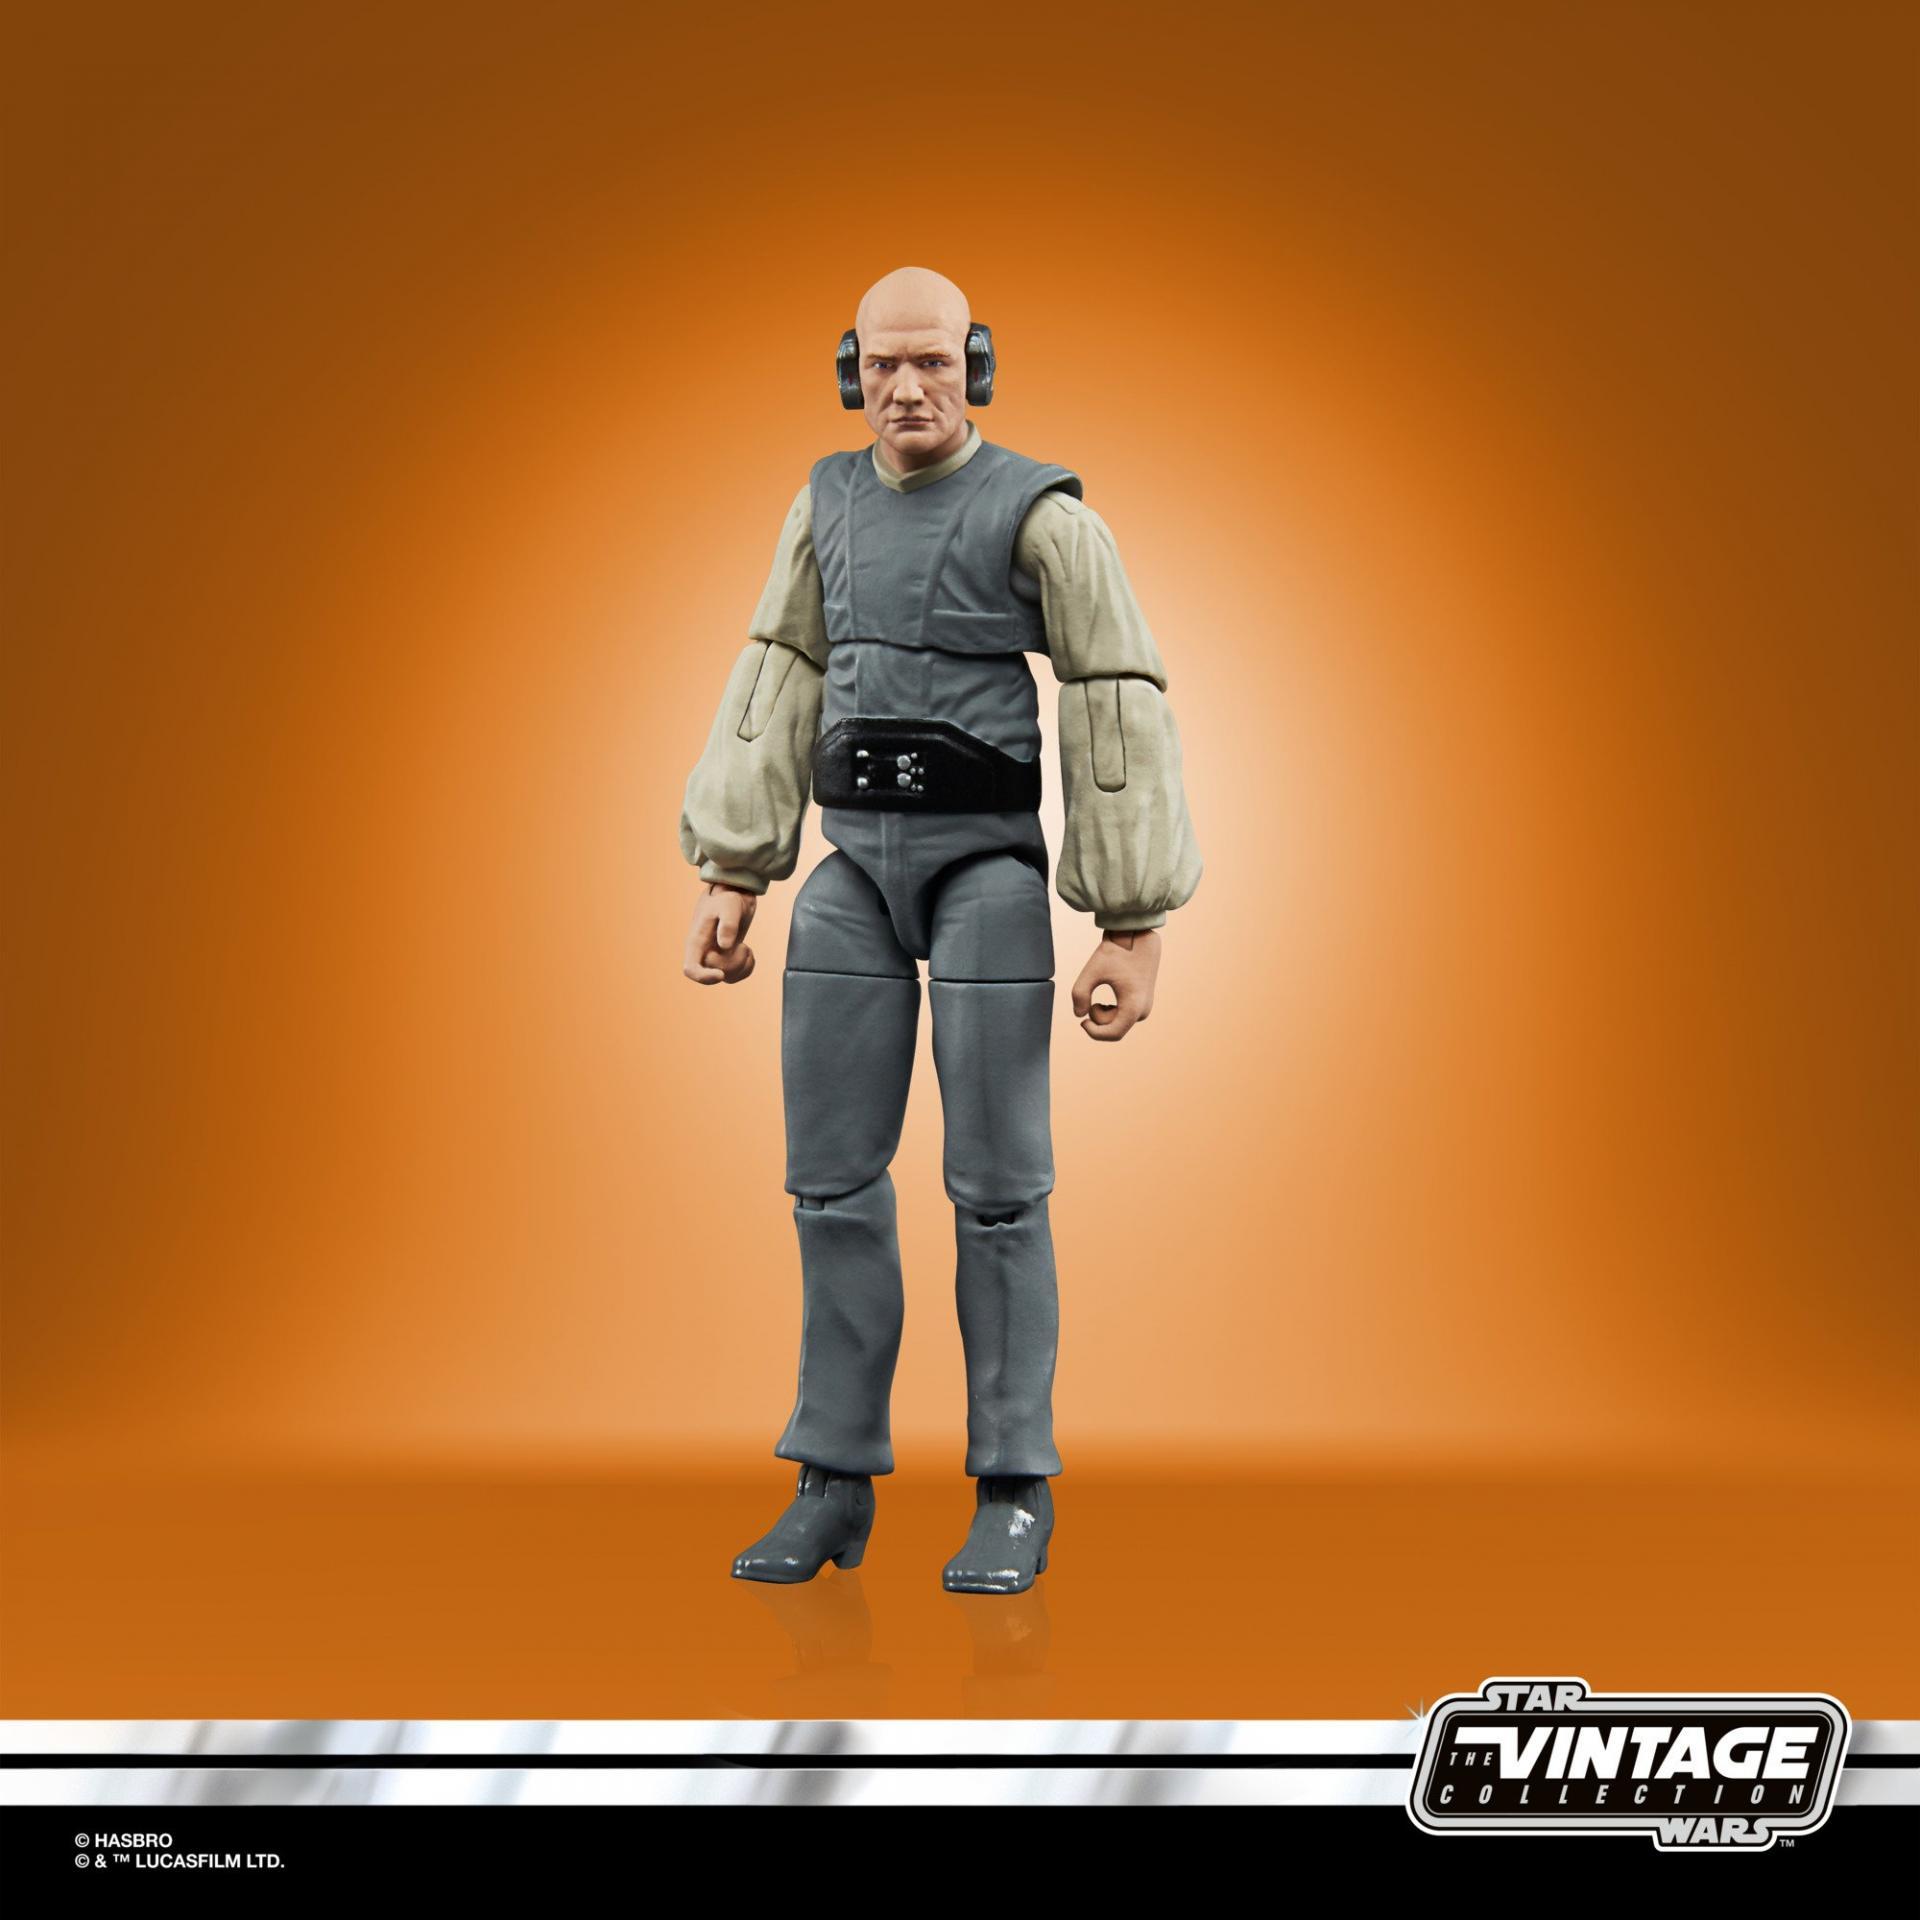 Star wars the vintage collection lobot